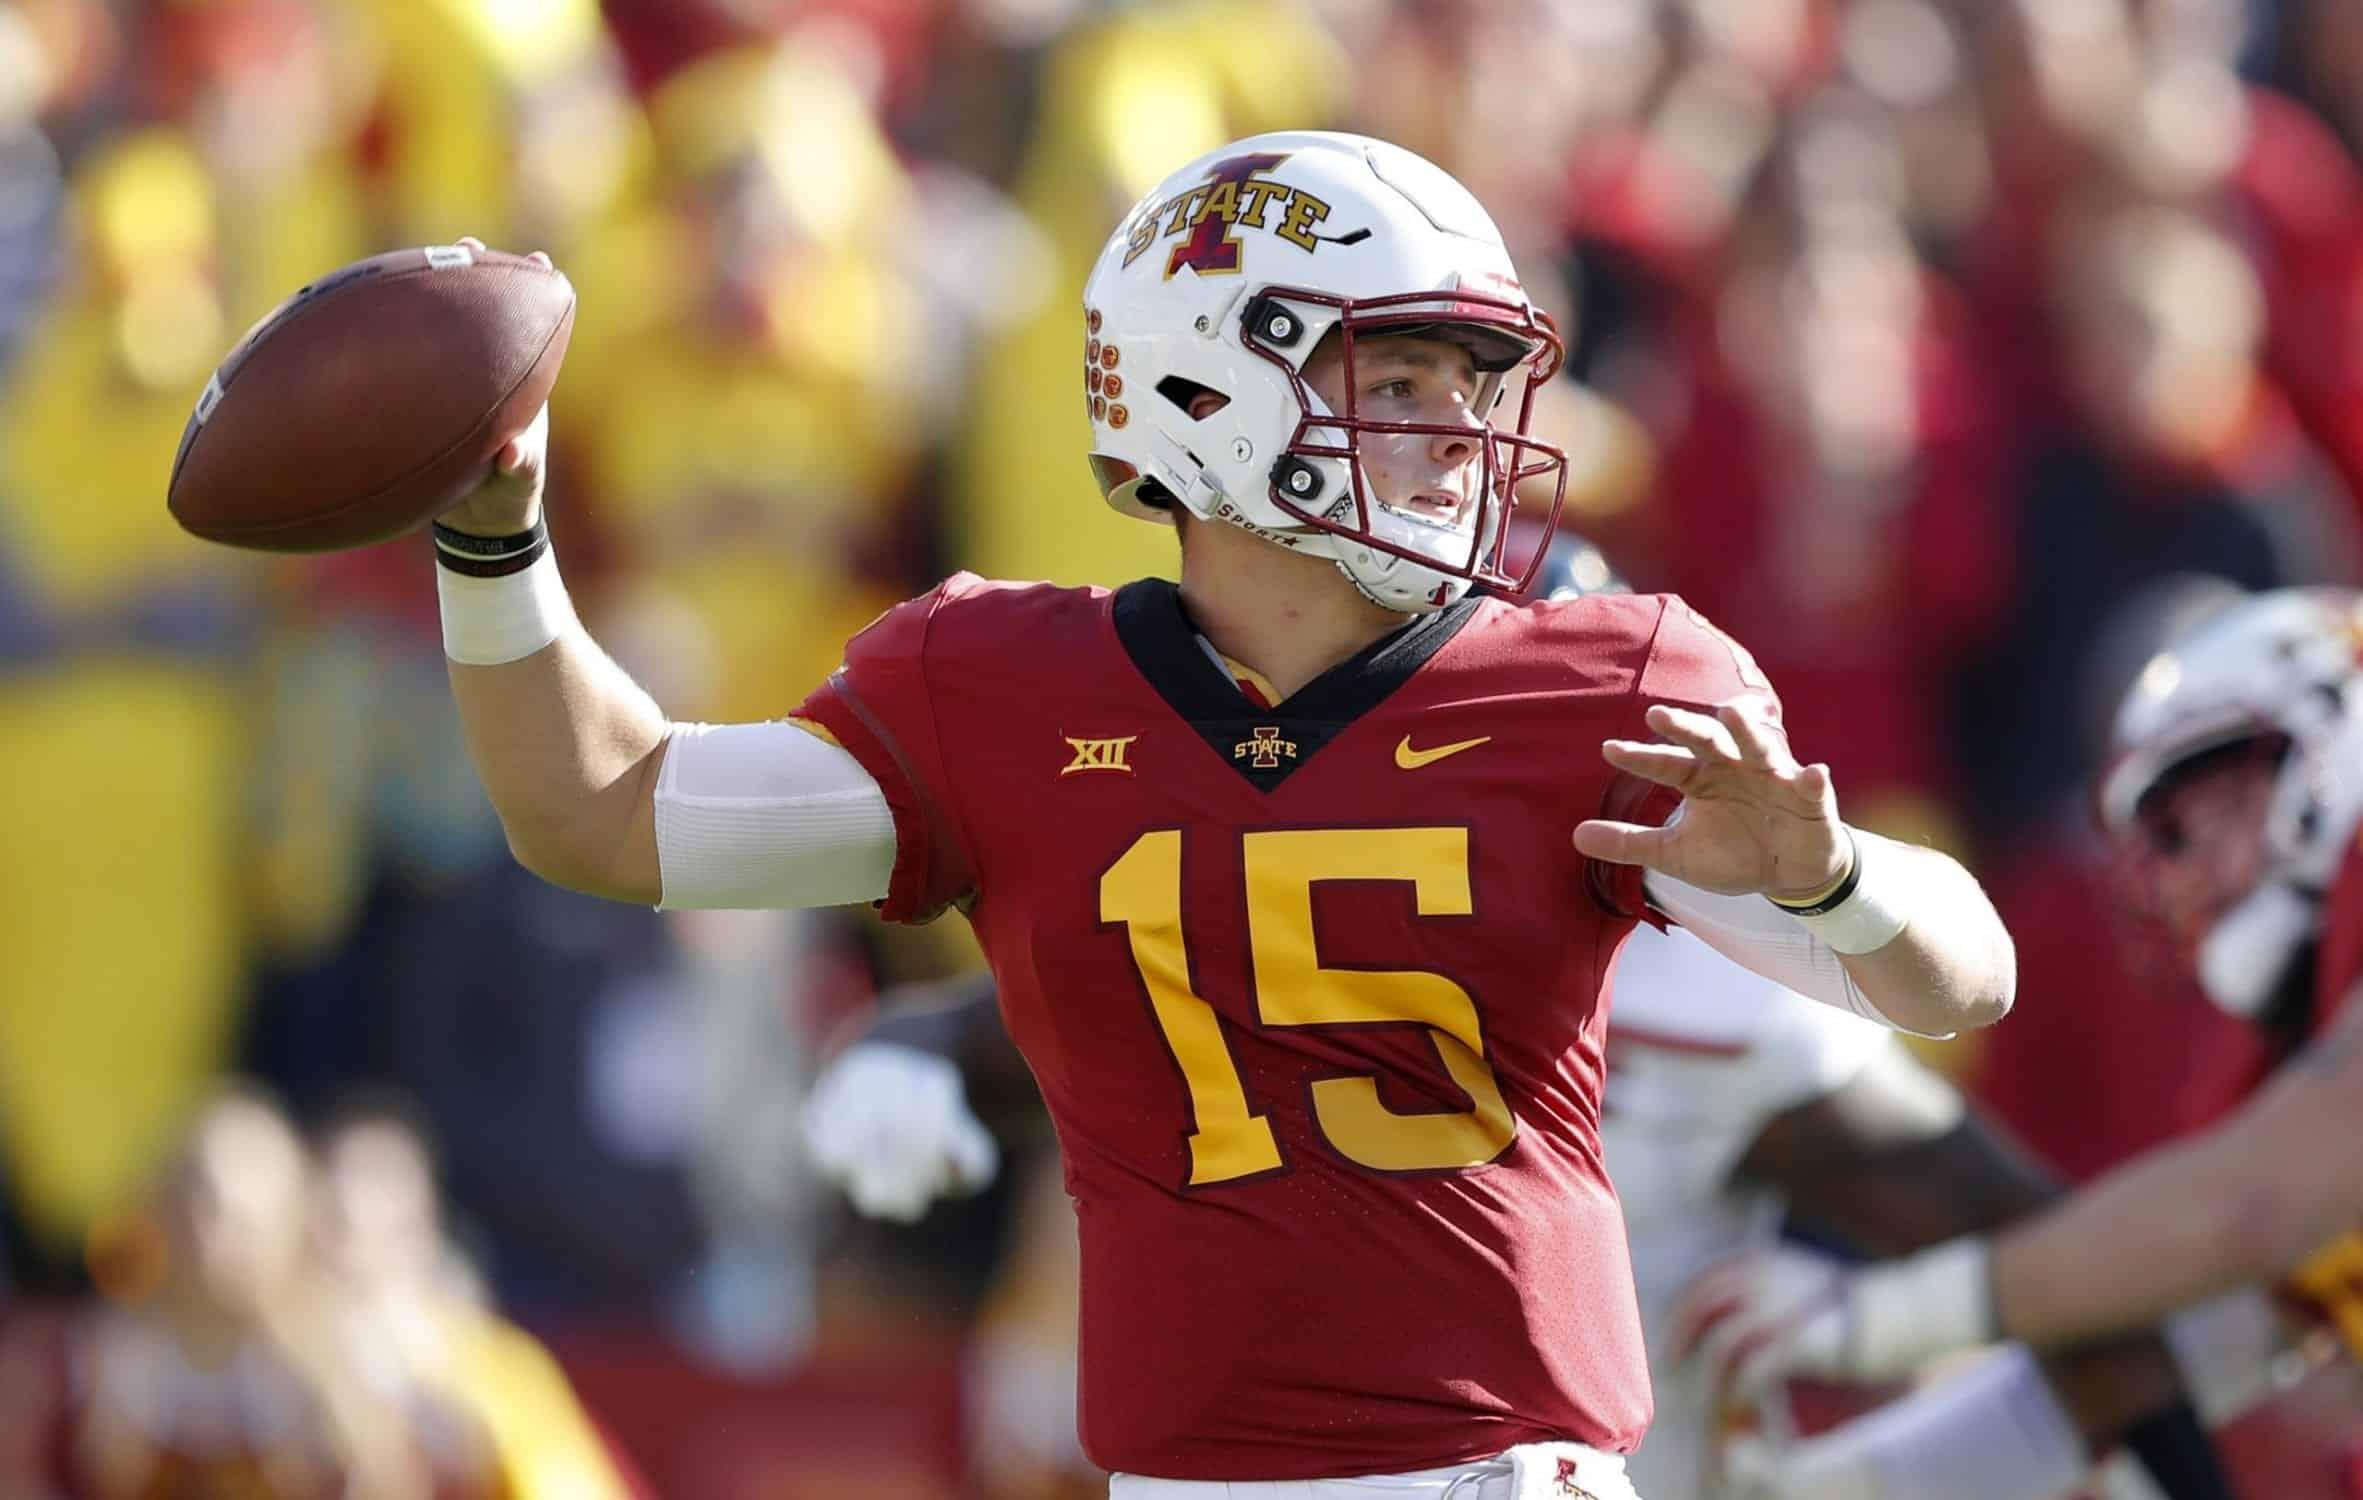 2021 NFL Draft: Three long-term replacements for Matt Ryan